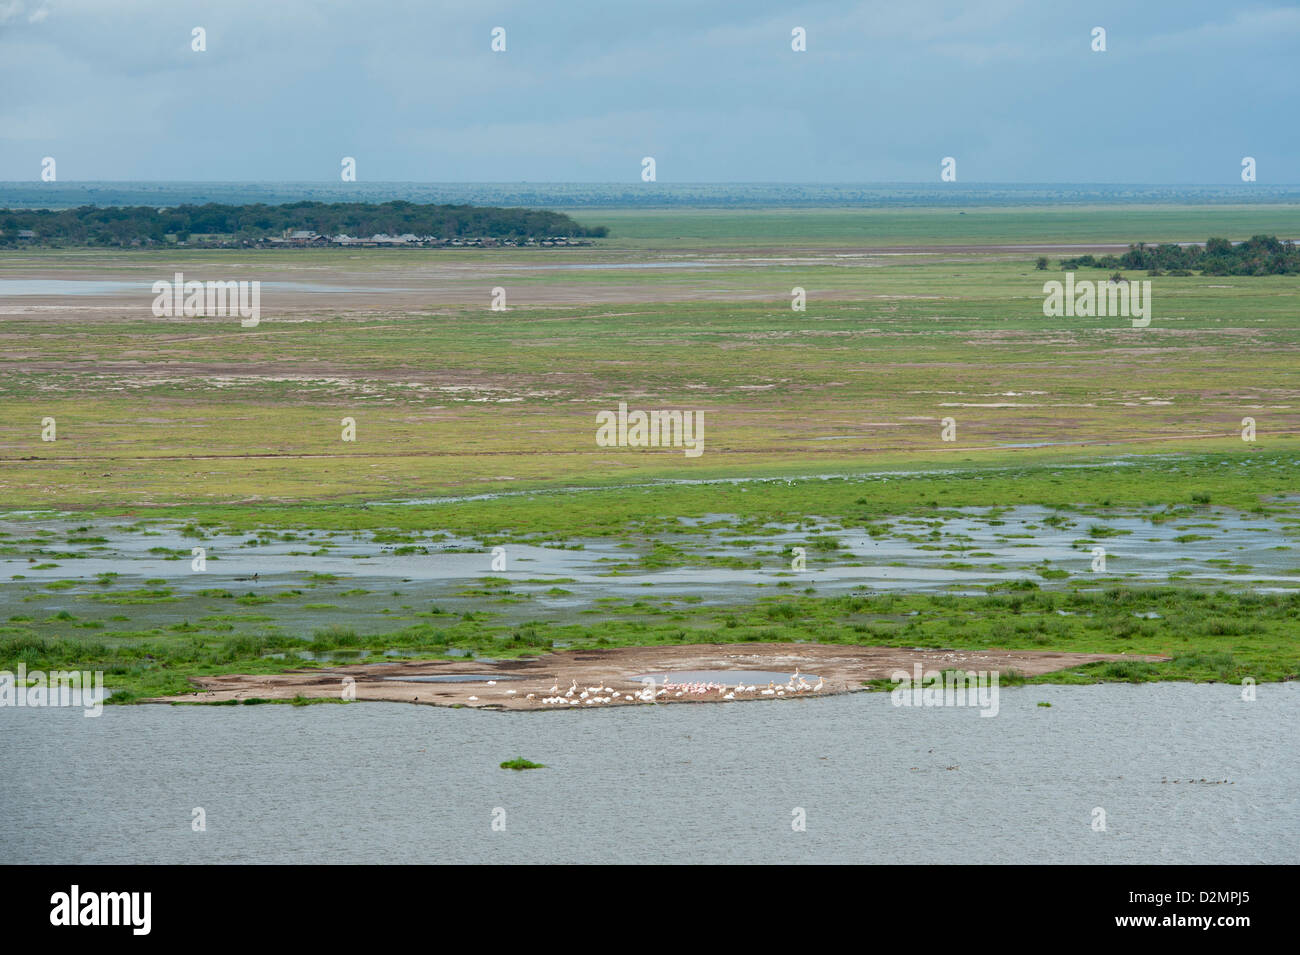 Pelicans and flamingos at the marsh, Amboseli National Park, Kenya - Stock Image